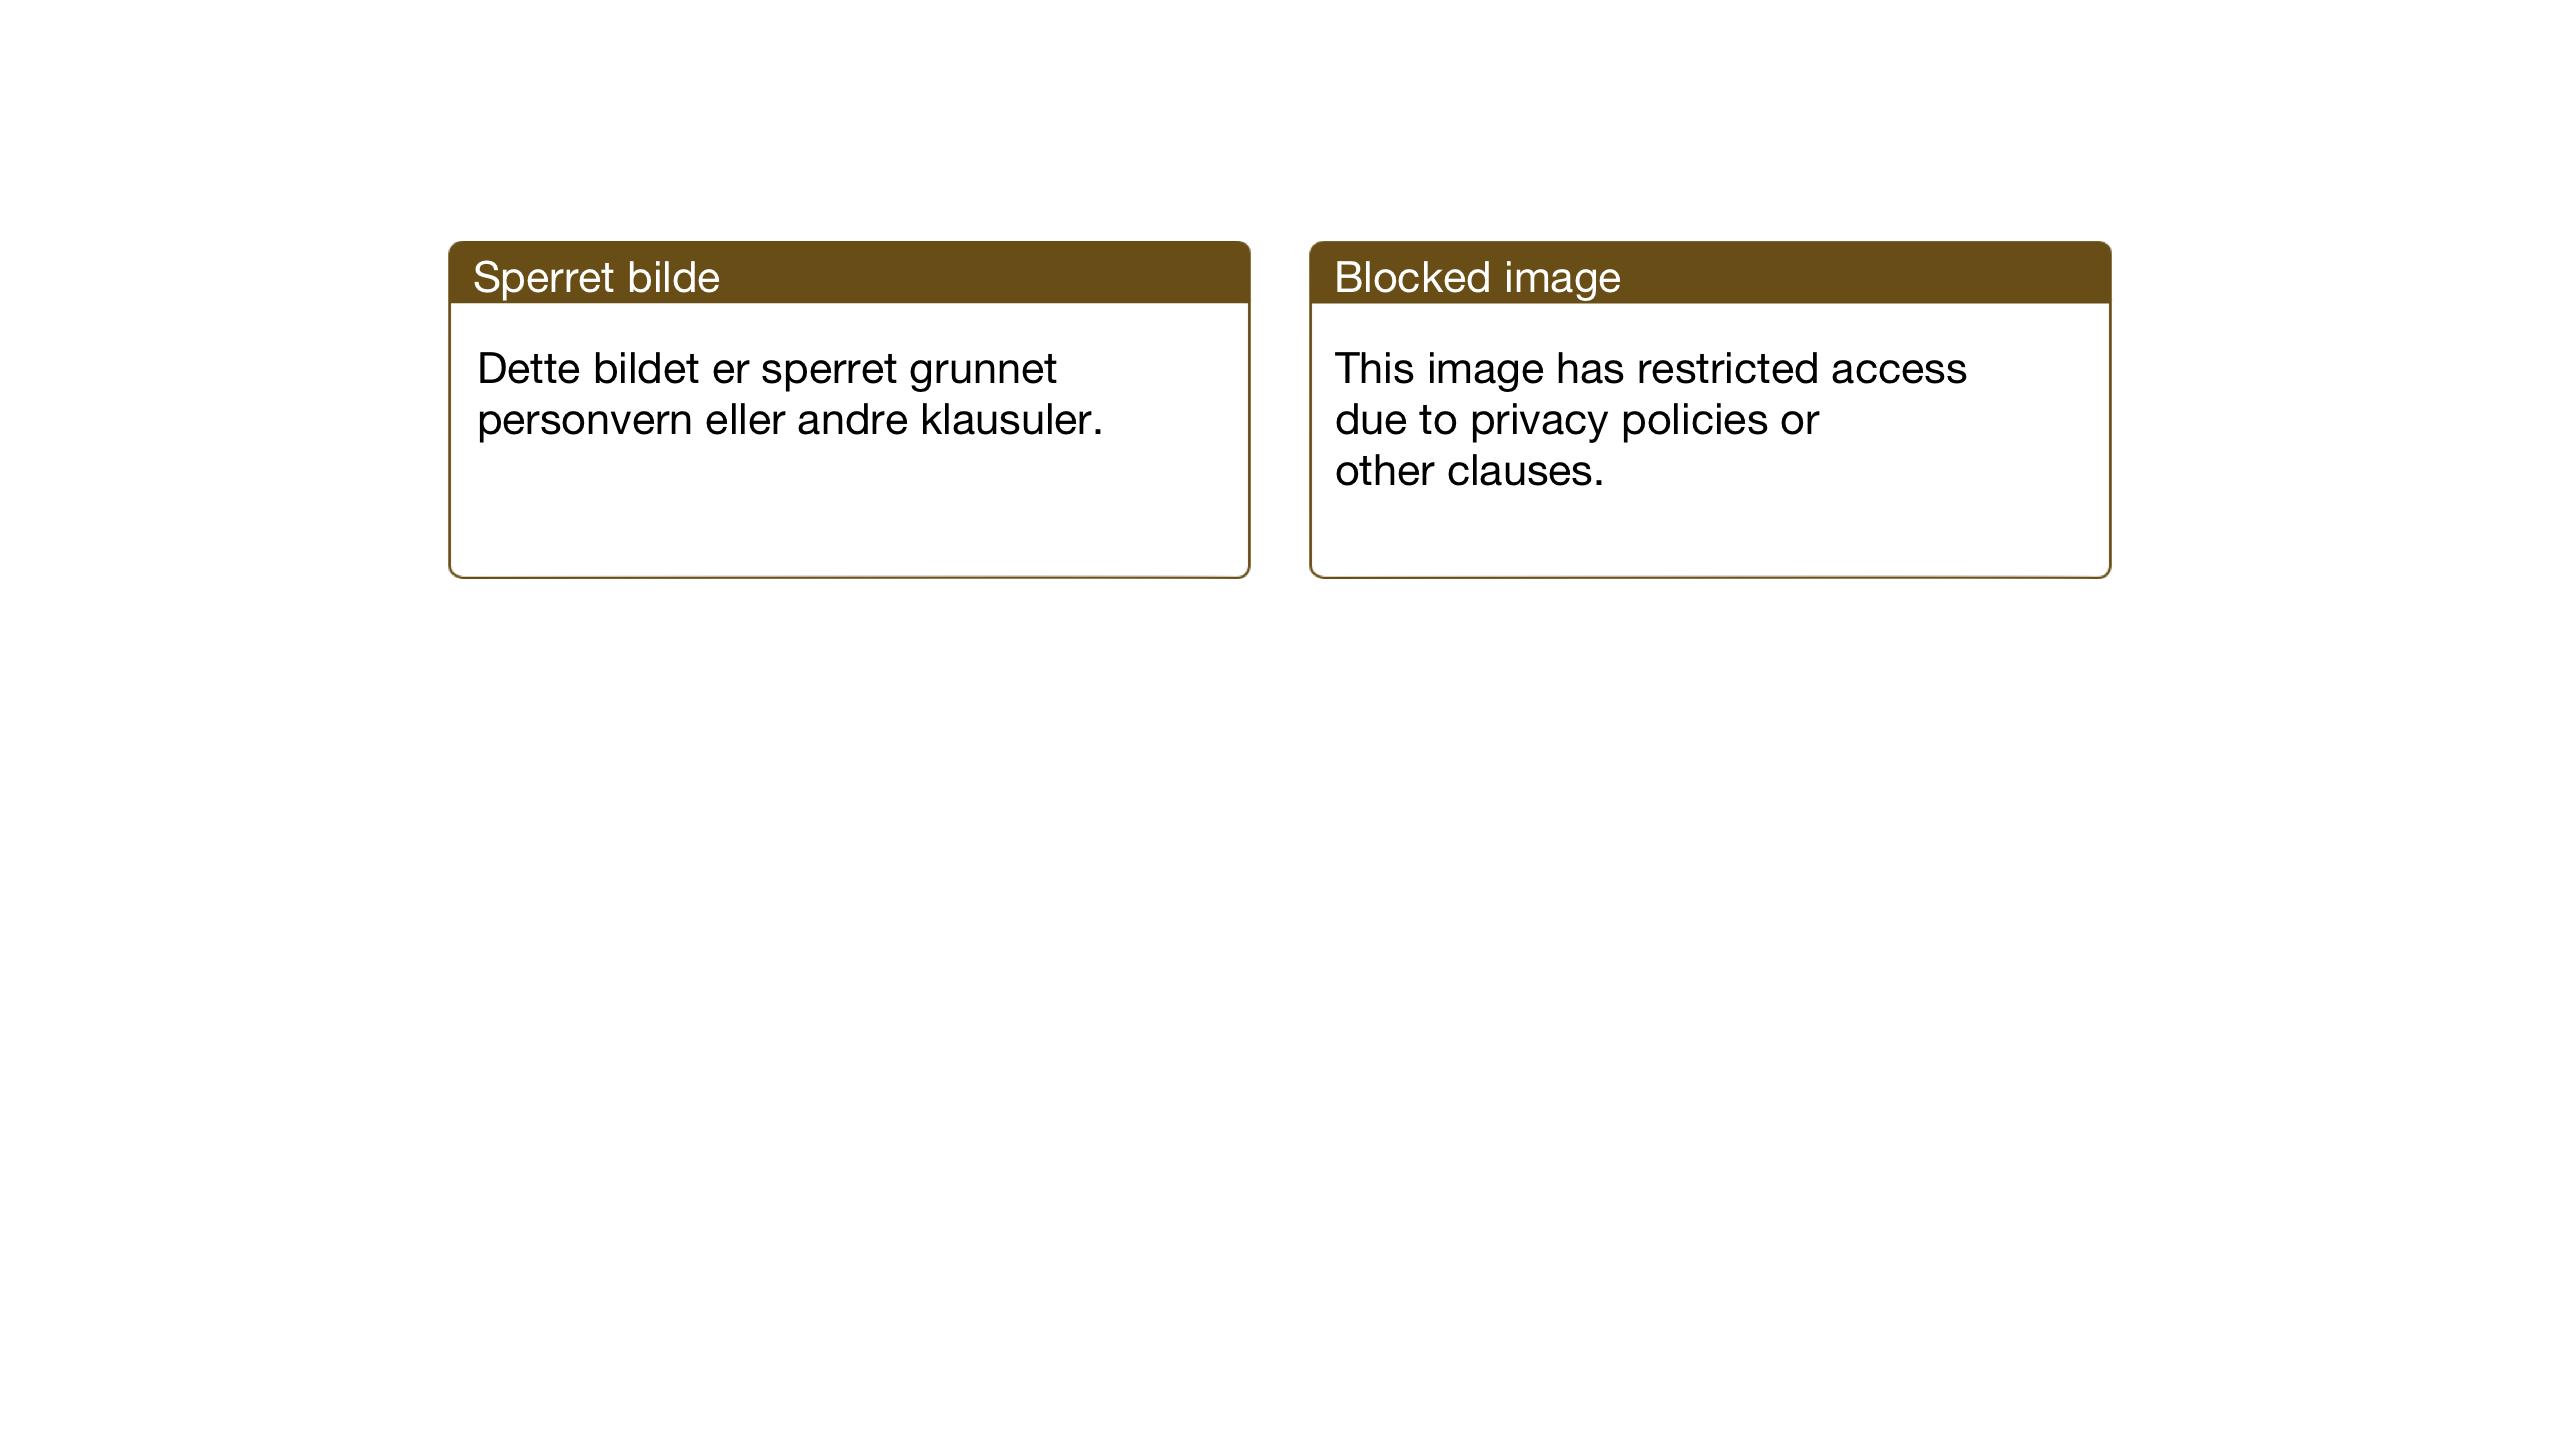 SAB, Domkirken Sokneprestembete, H/Haa: Ministerialbok nr. C 9, 1958-2001, s. 156b-157a